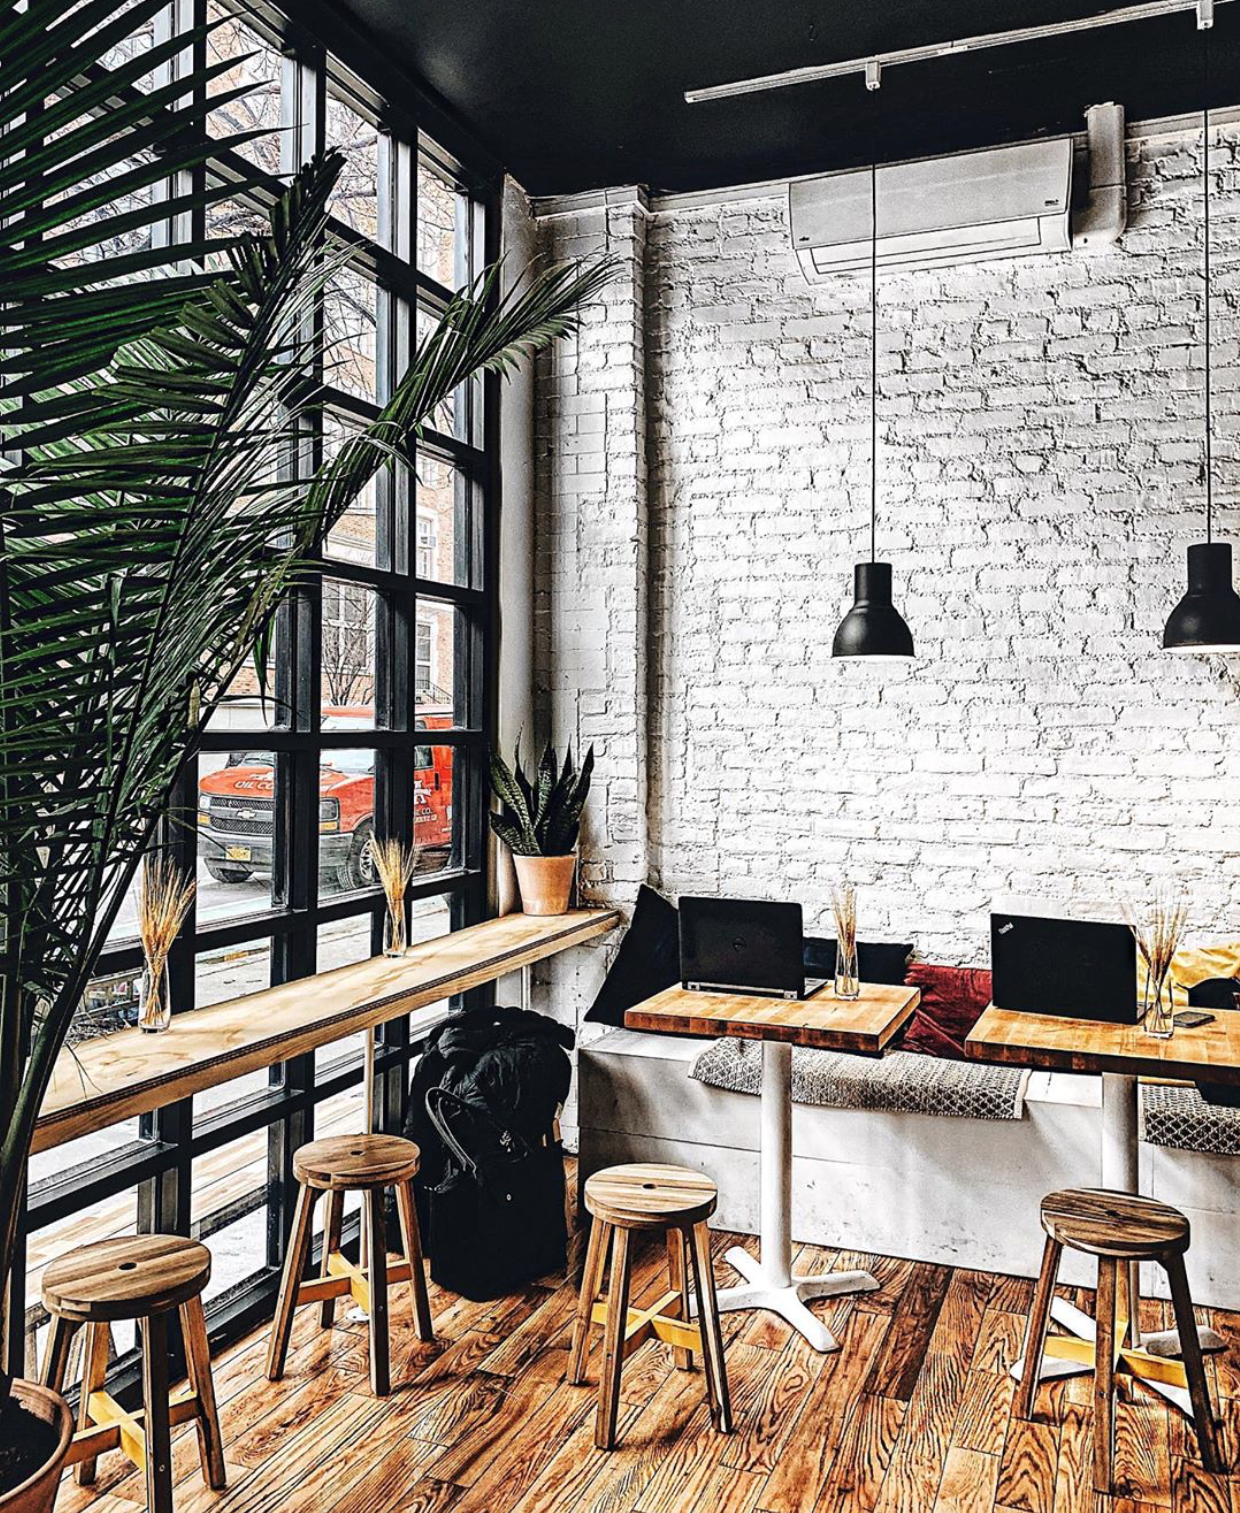 Coffee house interior